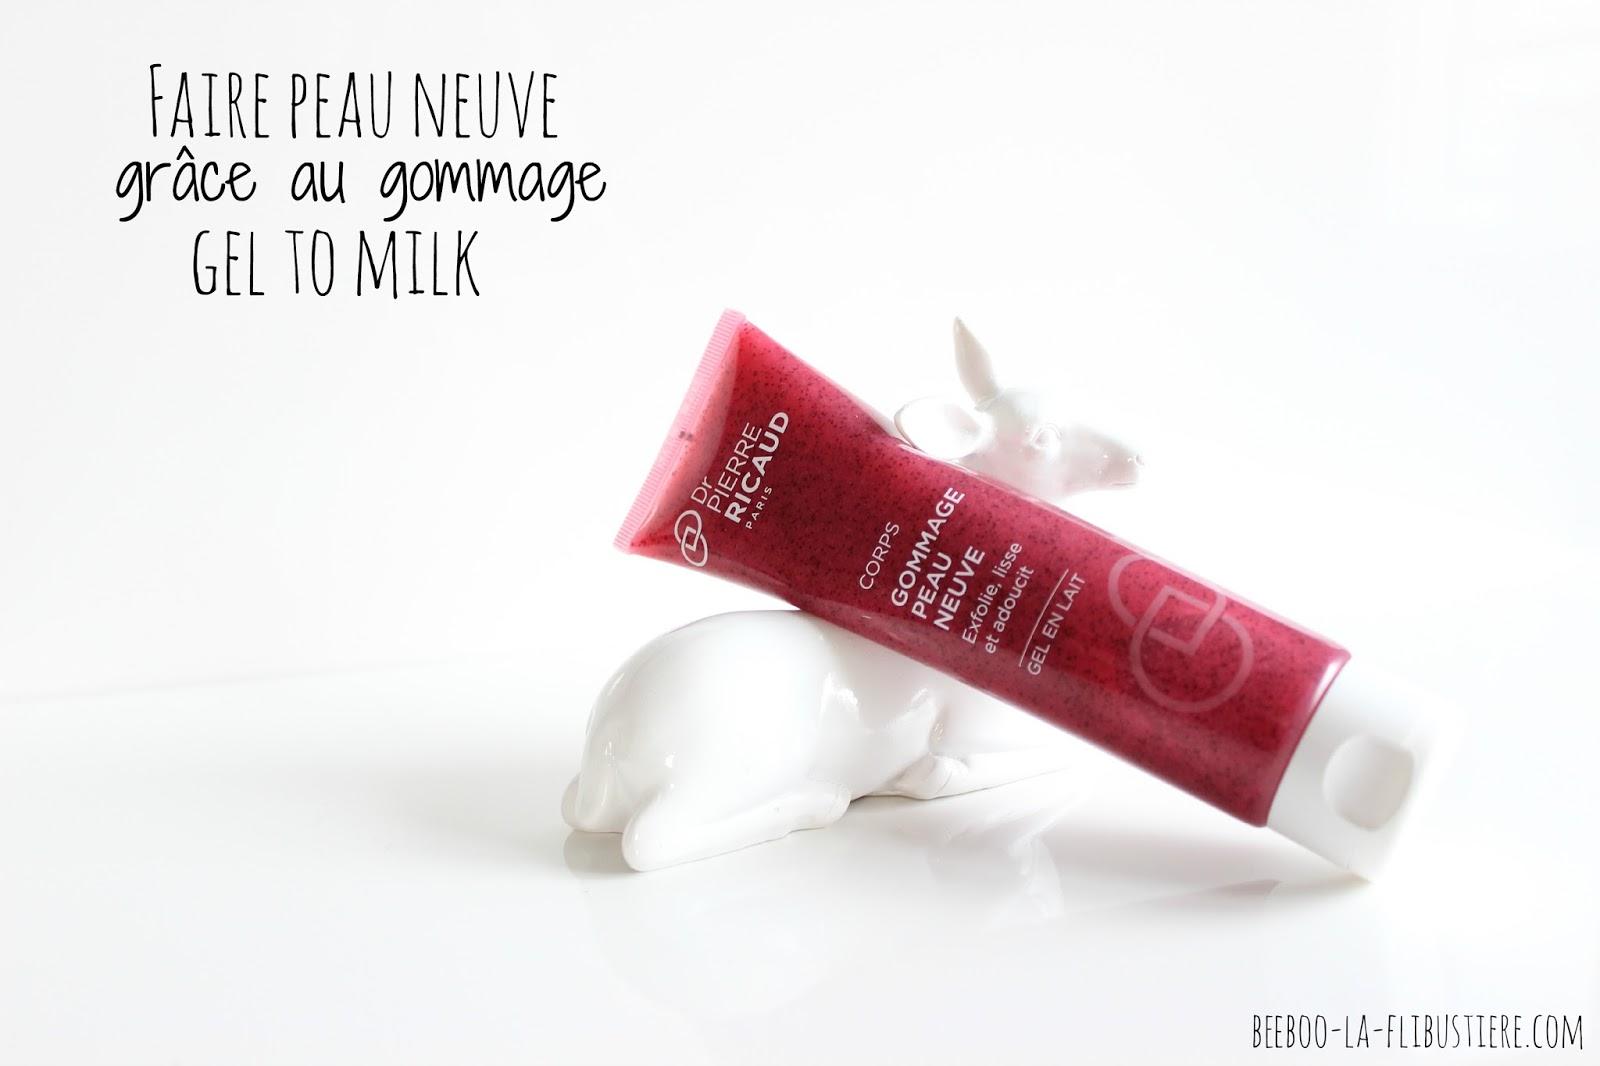 gommage peau neuve gel to milk dr pierre ricaud